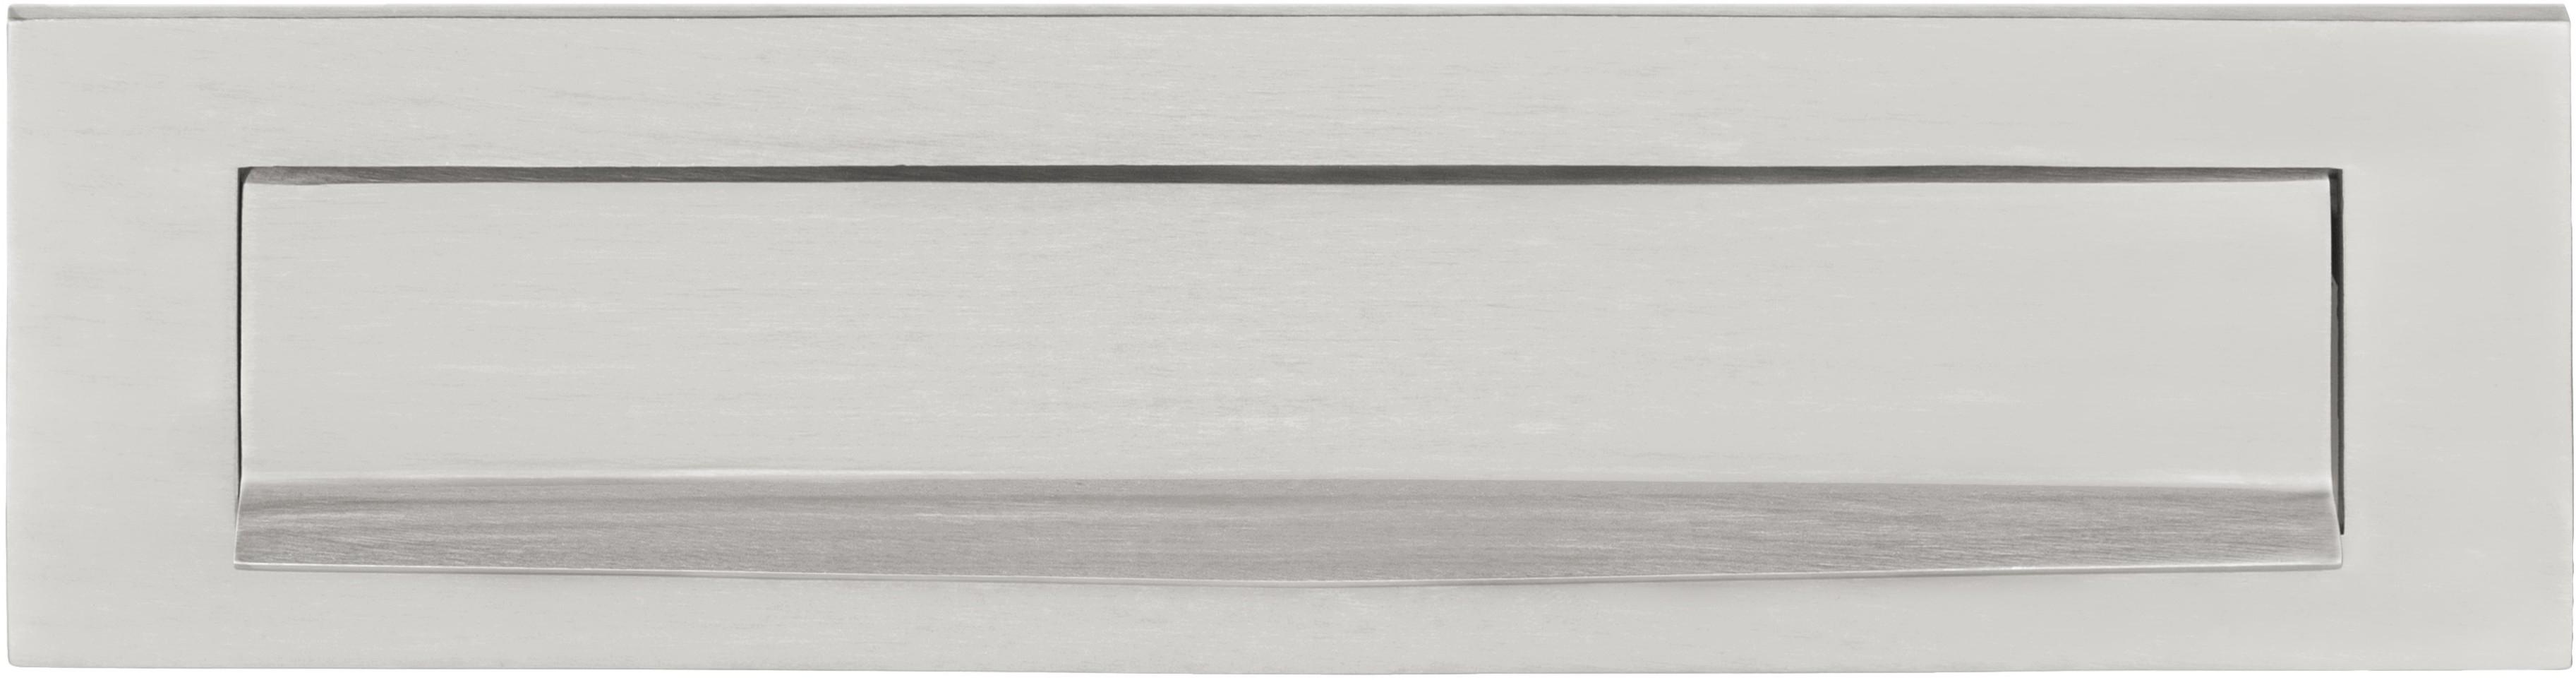 Formani BASIC LB535 briefplaat RVS